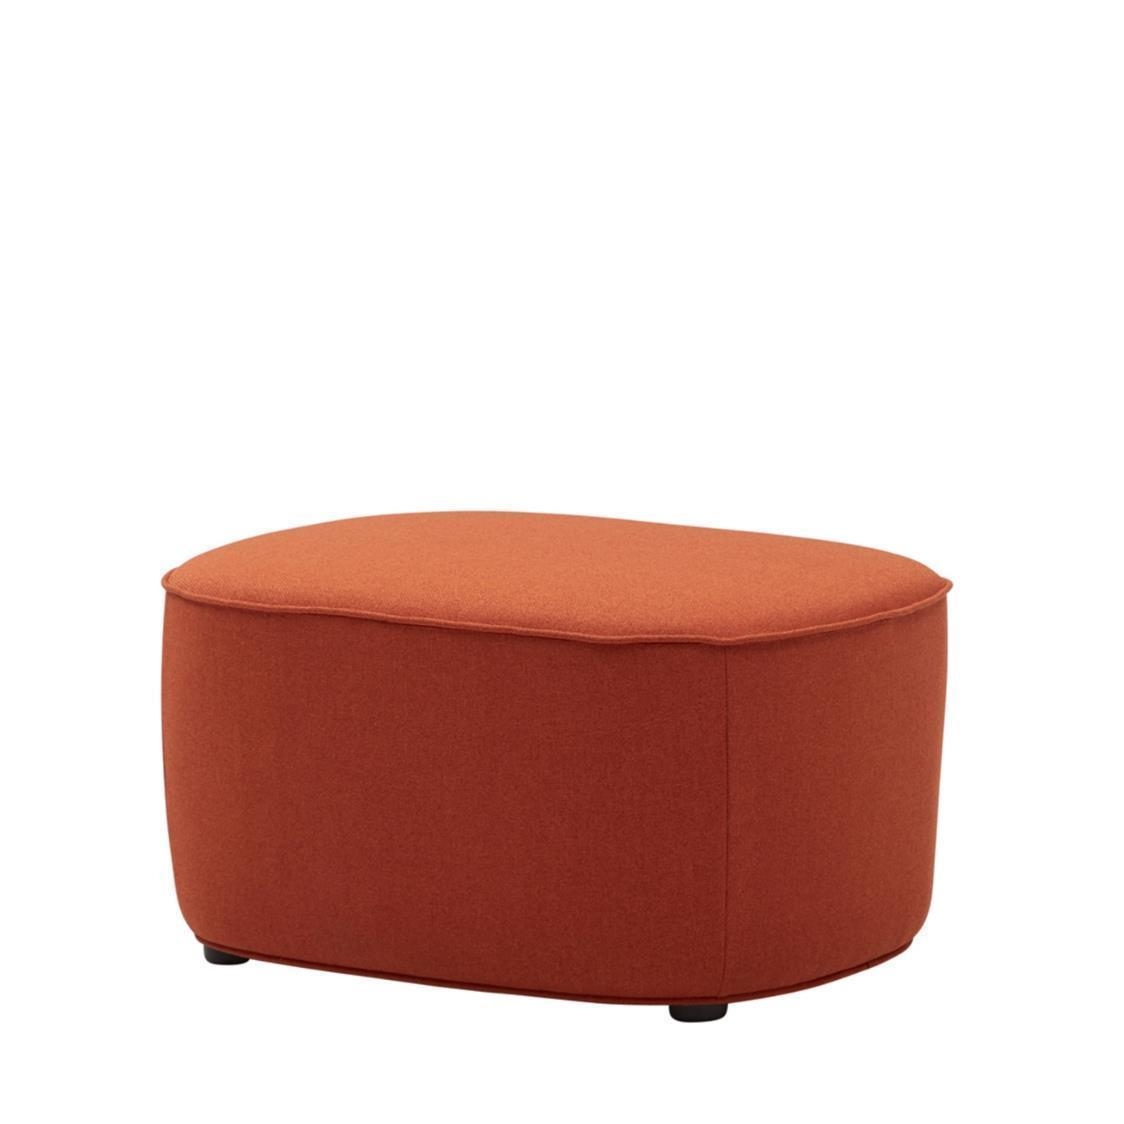 Iloom Stone Ottoman 458 Brick Orange